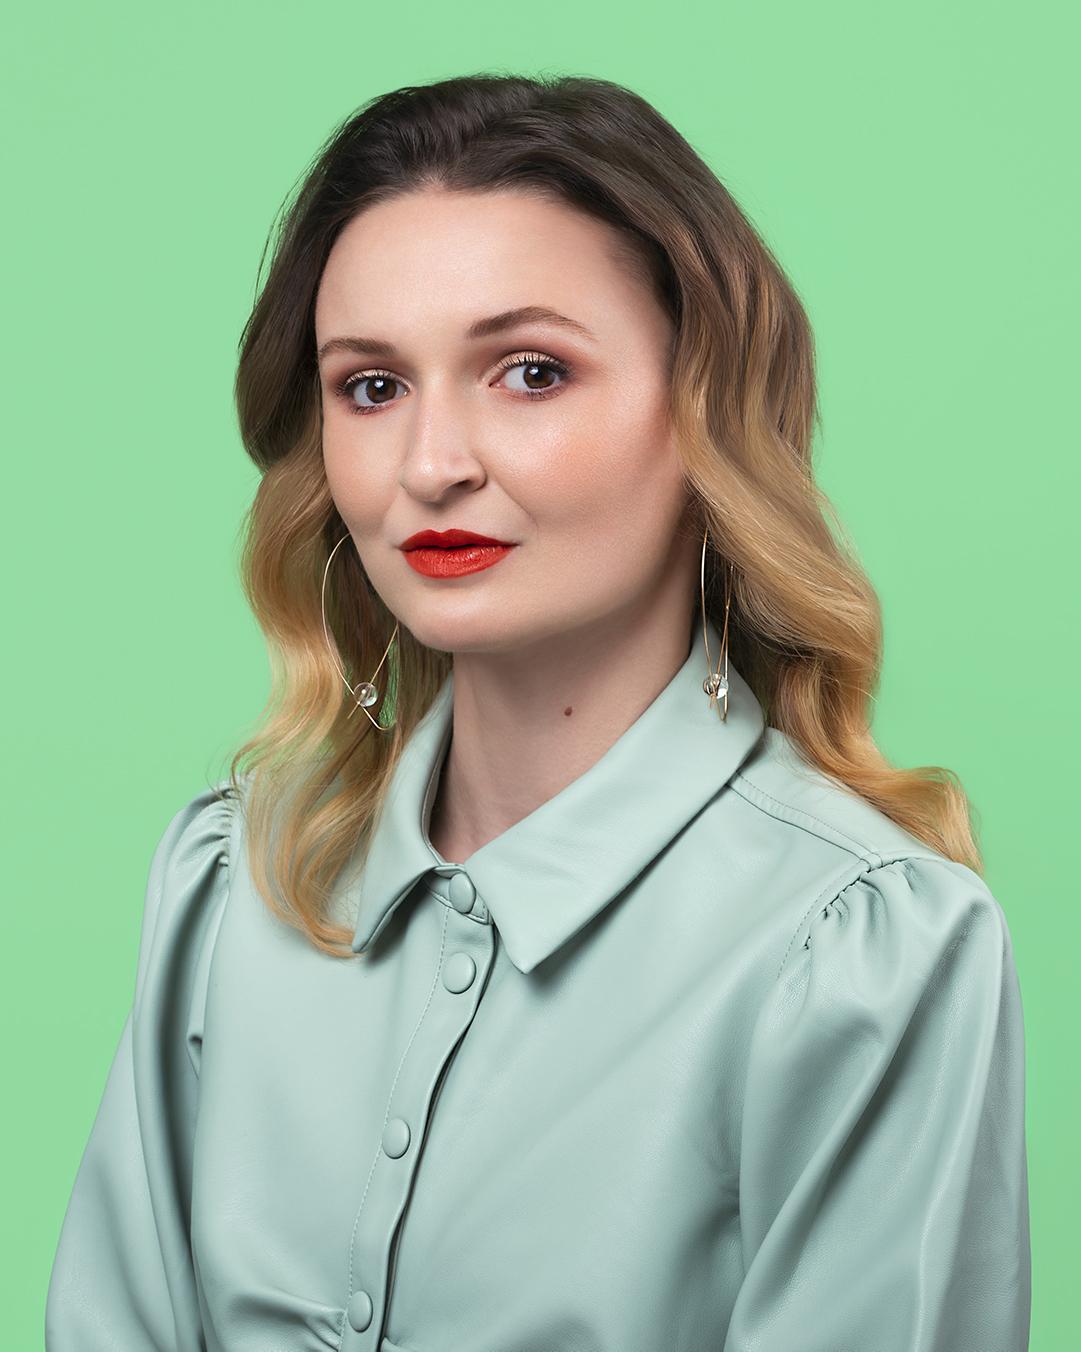 Lucy – portrét Persony IG